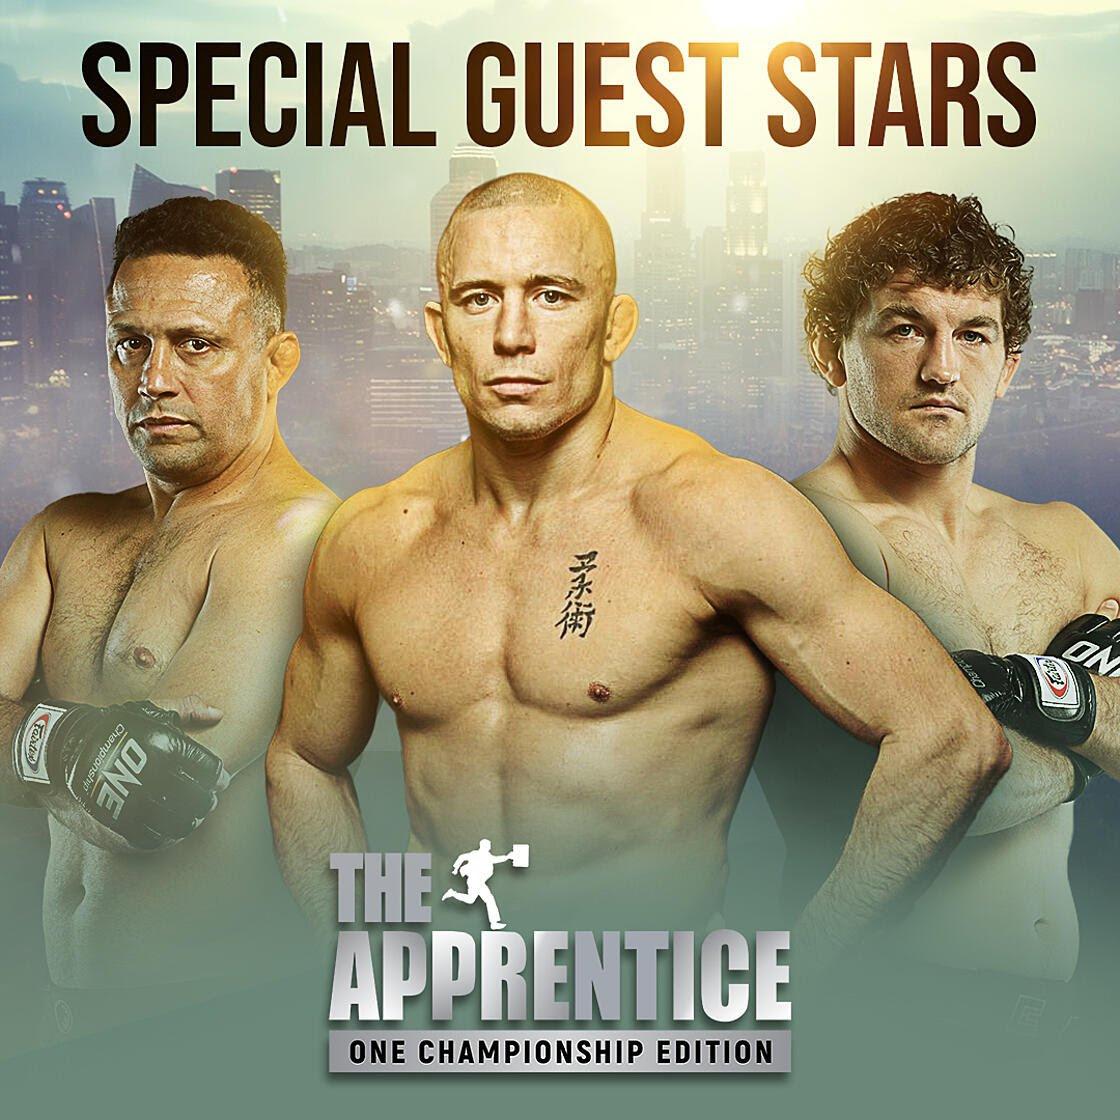 GSP, Renzo Gracie, Ben Askren join The Apprentice: ONE Championship Edition